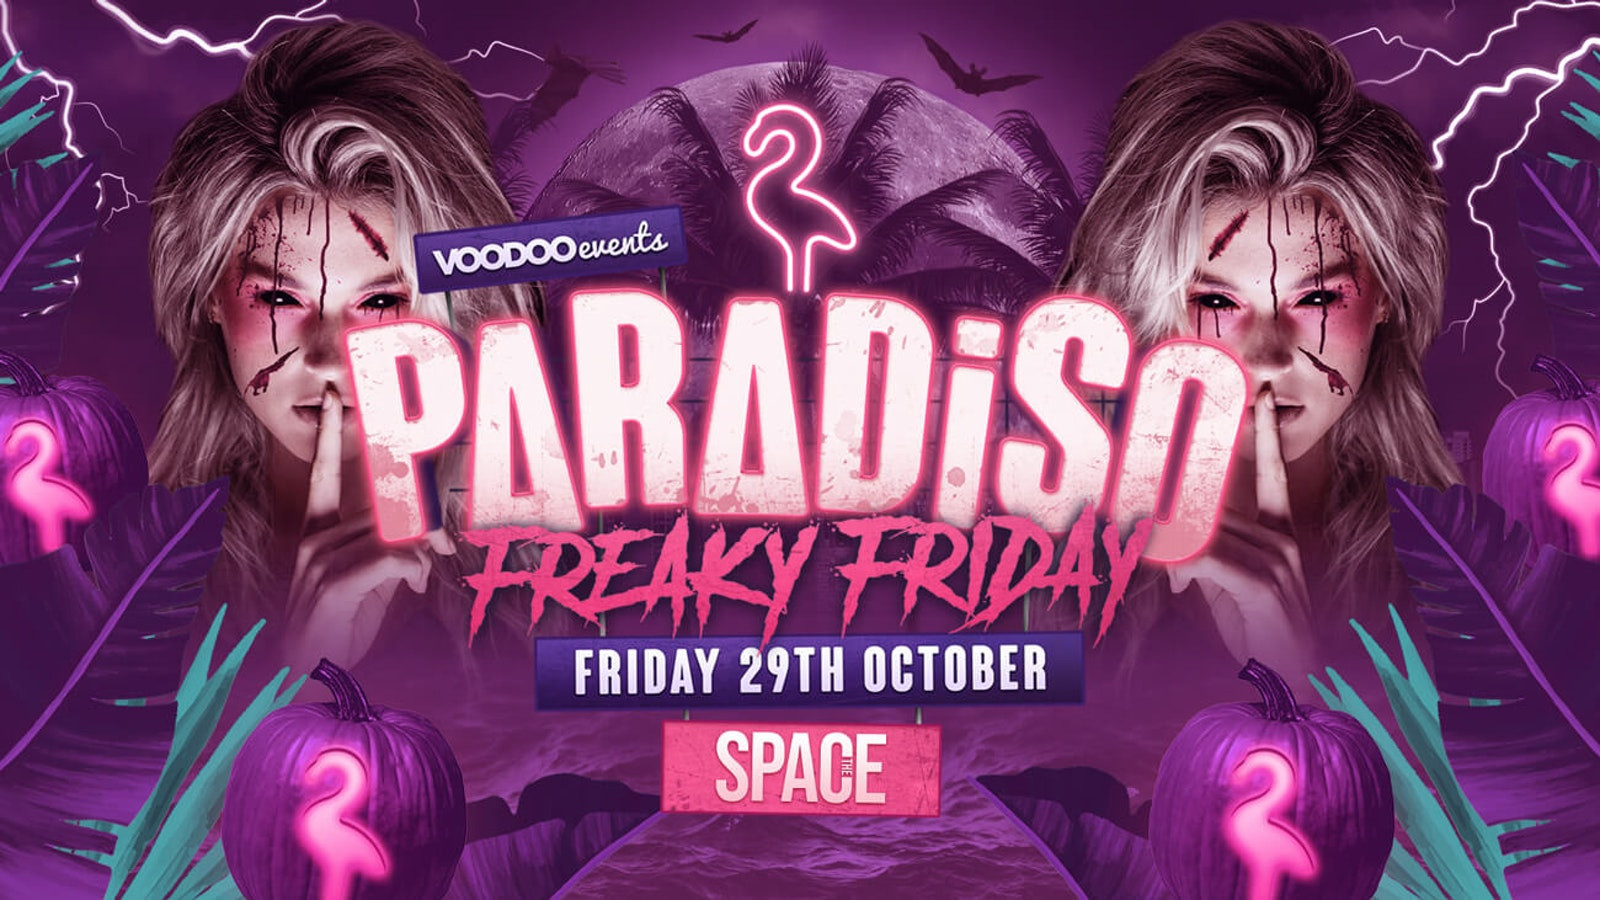 Paradiso Freaky Friday at Space – 29th October